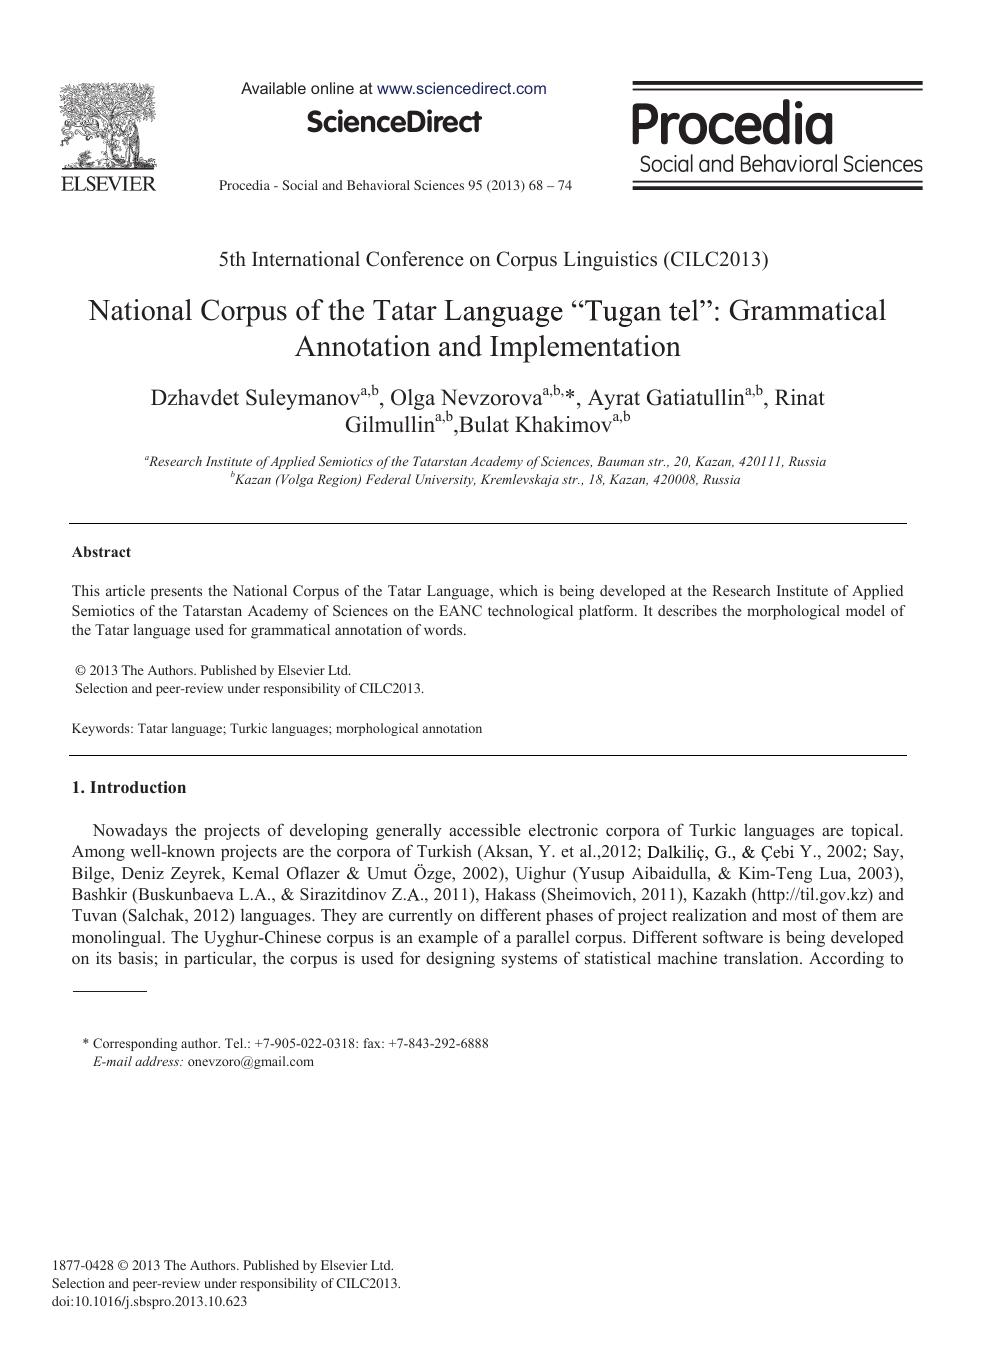 "National Corpus of the Tatar Language ""Tugan tel"